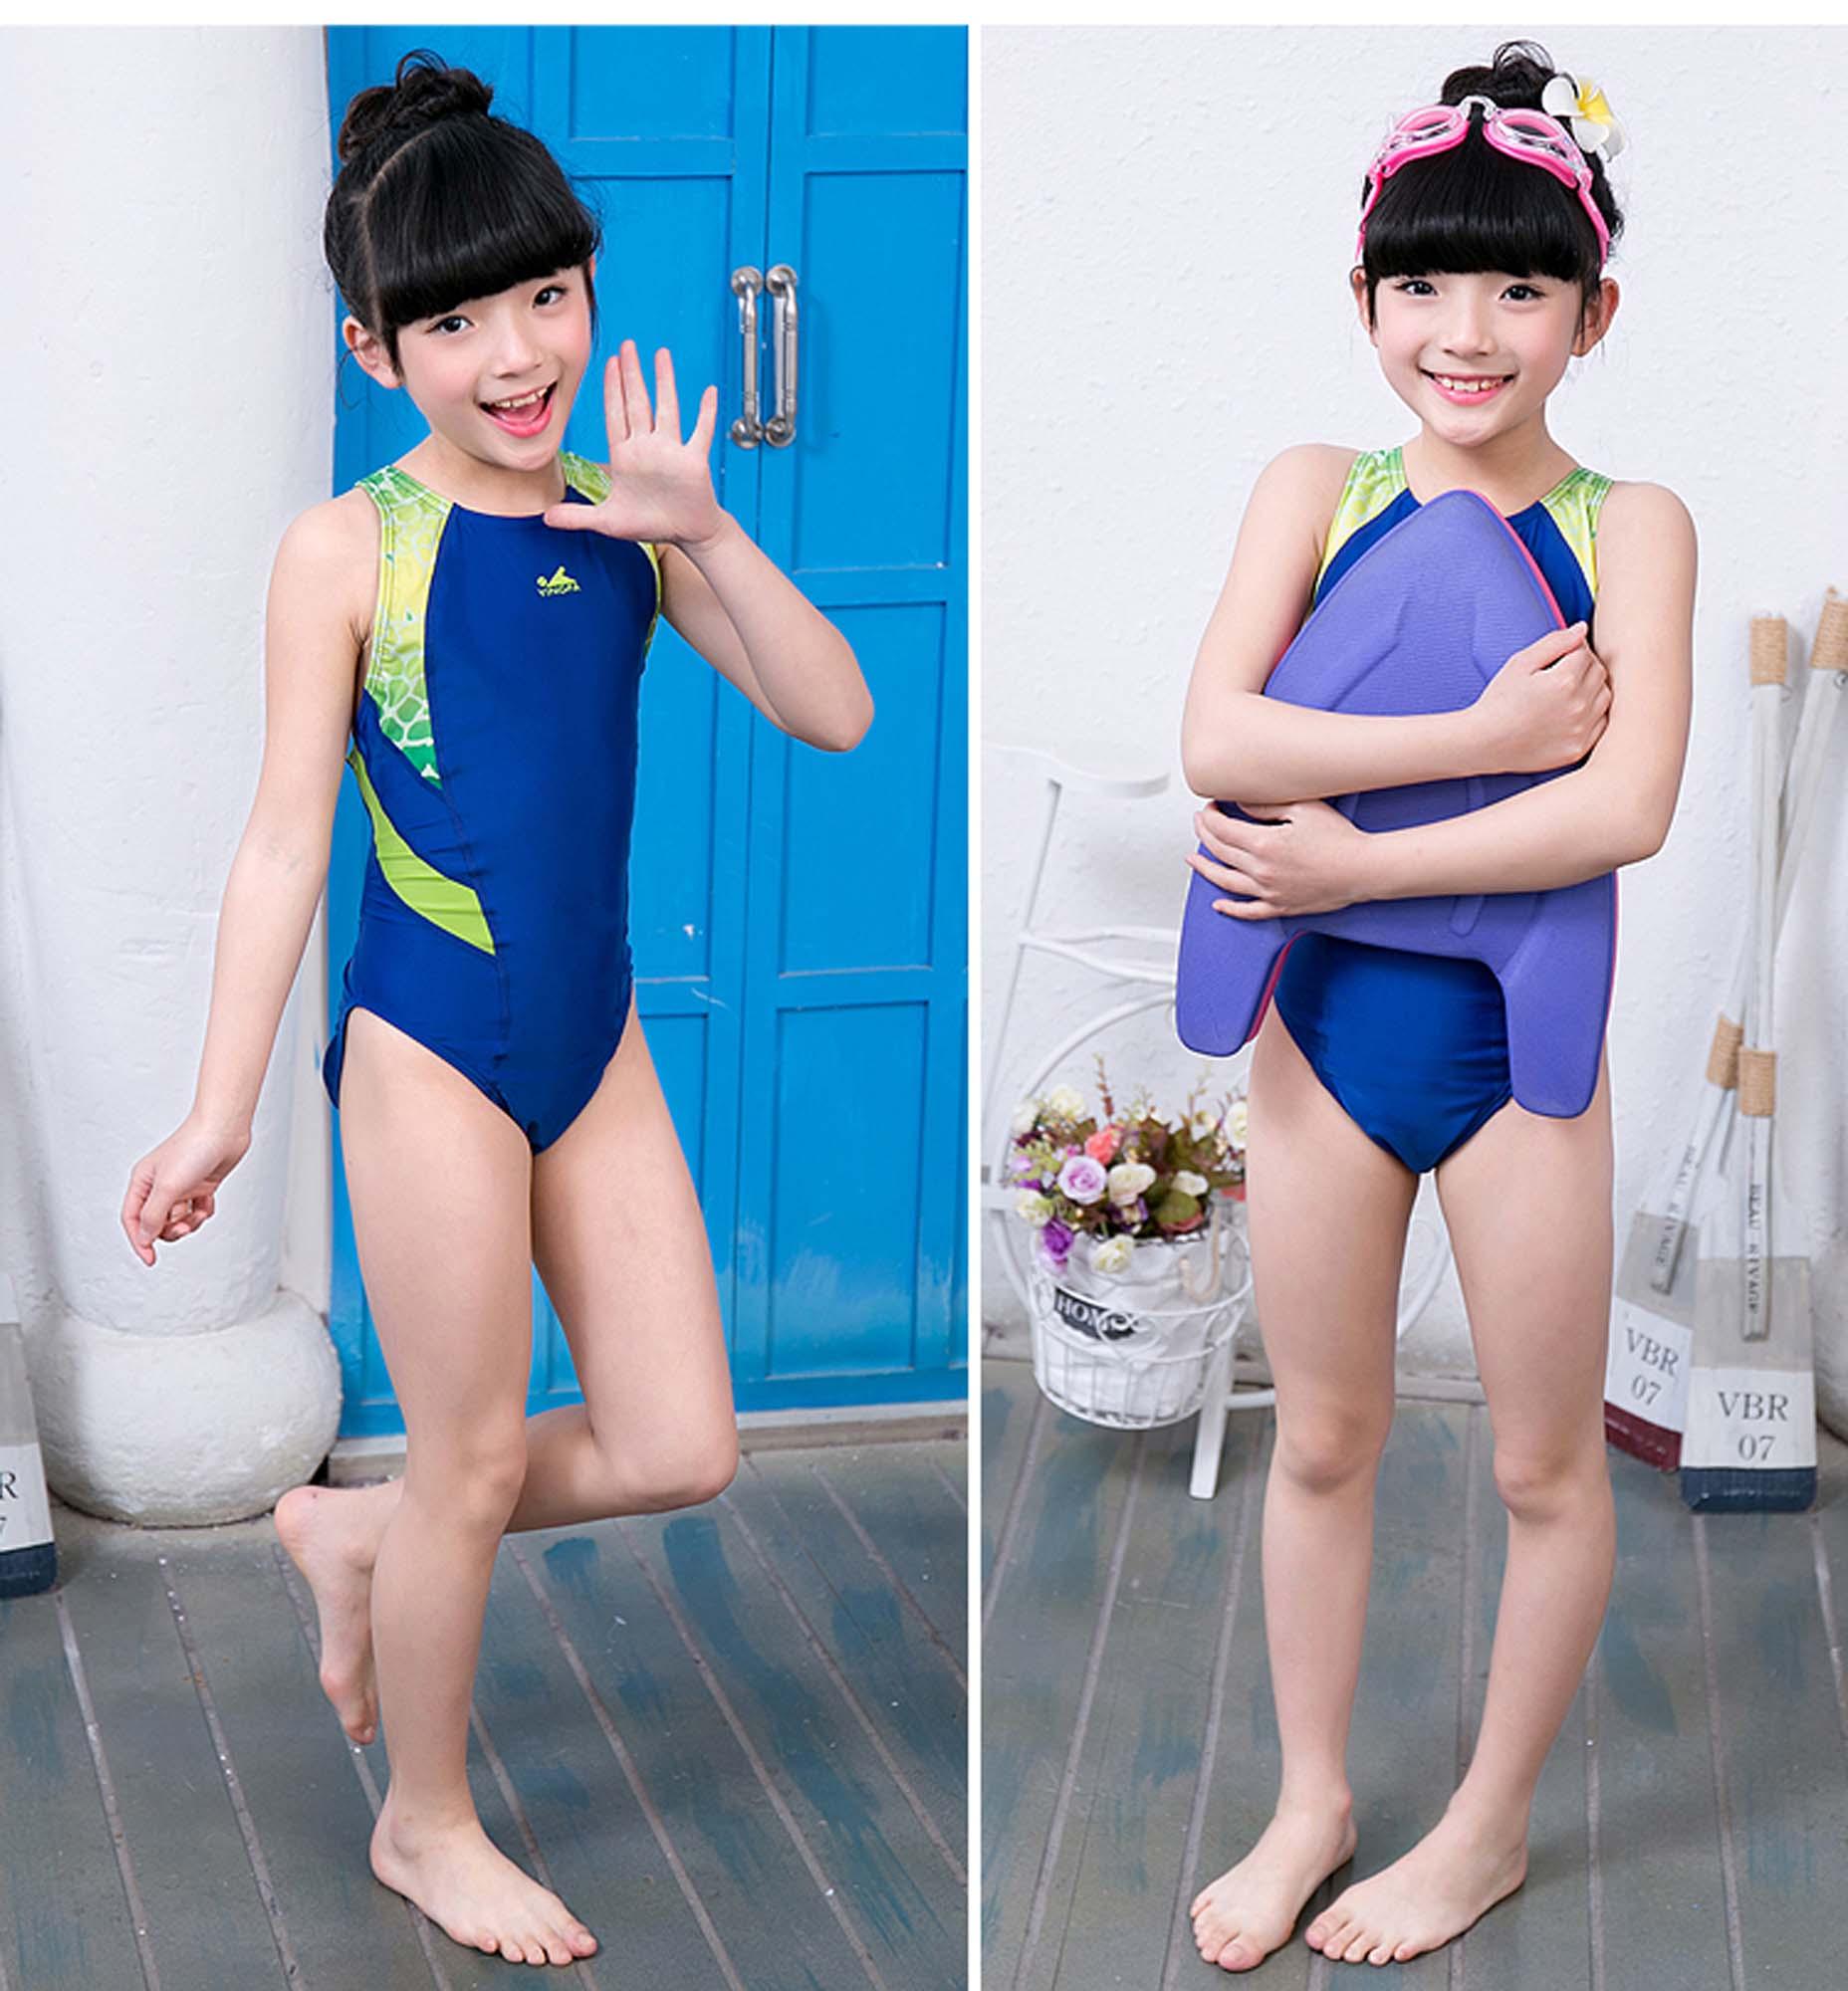 ebc73b76b574e One piece swimsuit-racing & training swimsuit for women and girls ...